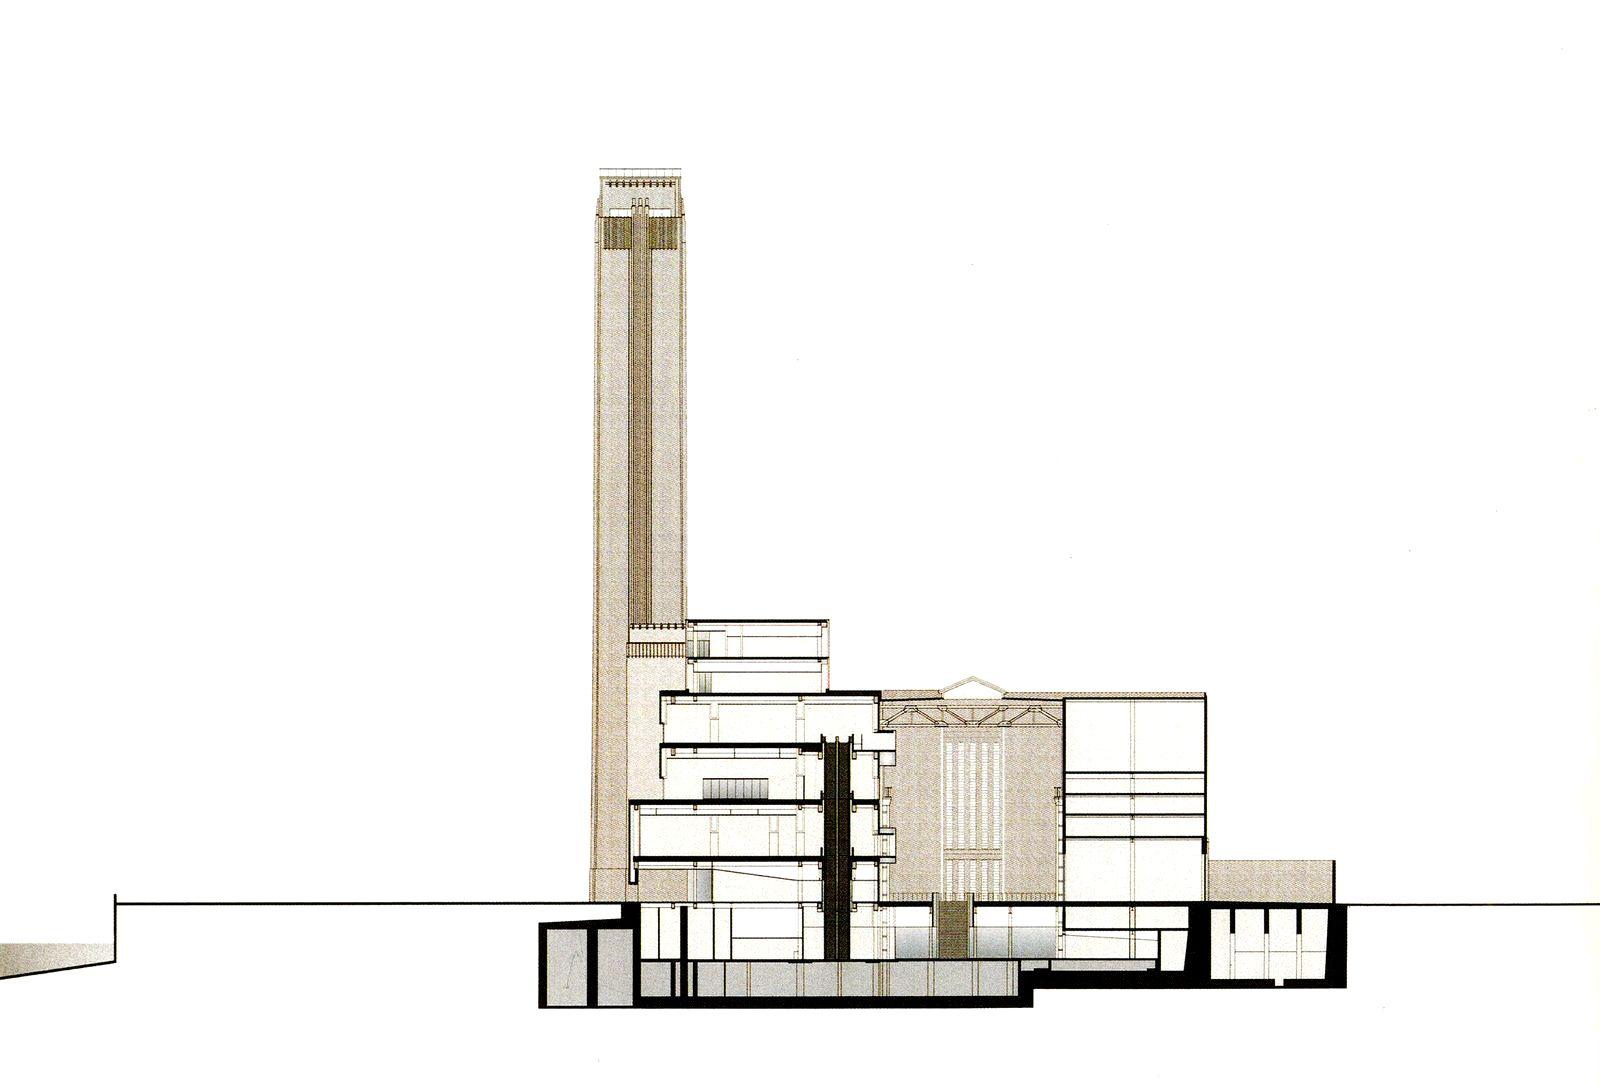 Hdm tate modern section representation darstellung for Tate modern building design